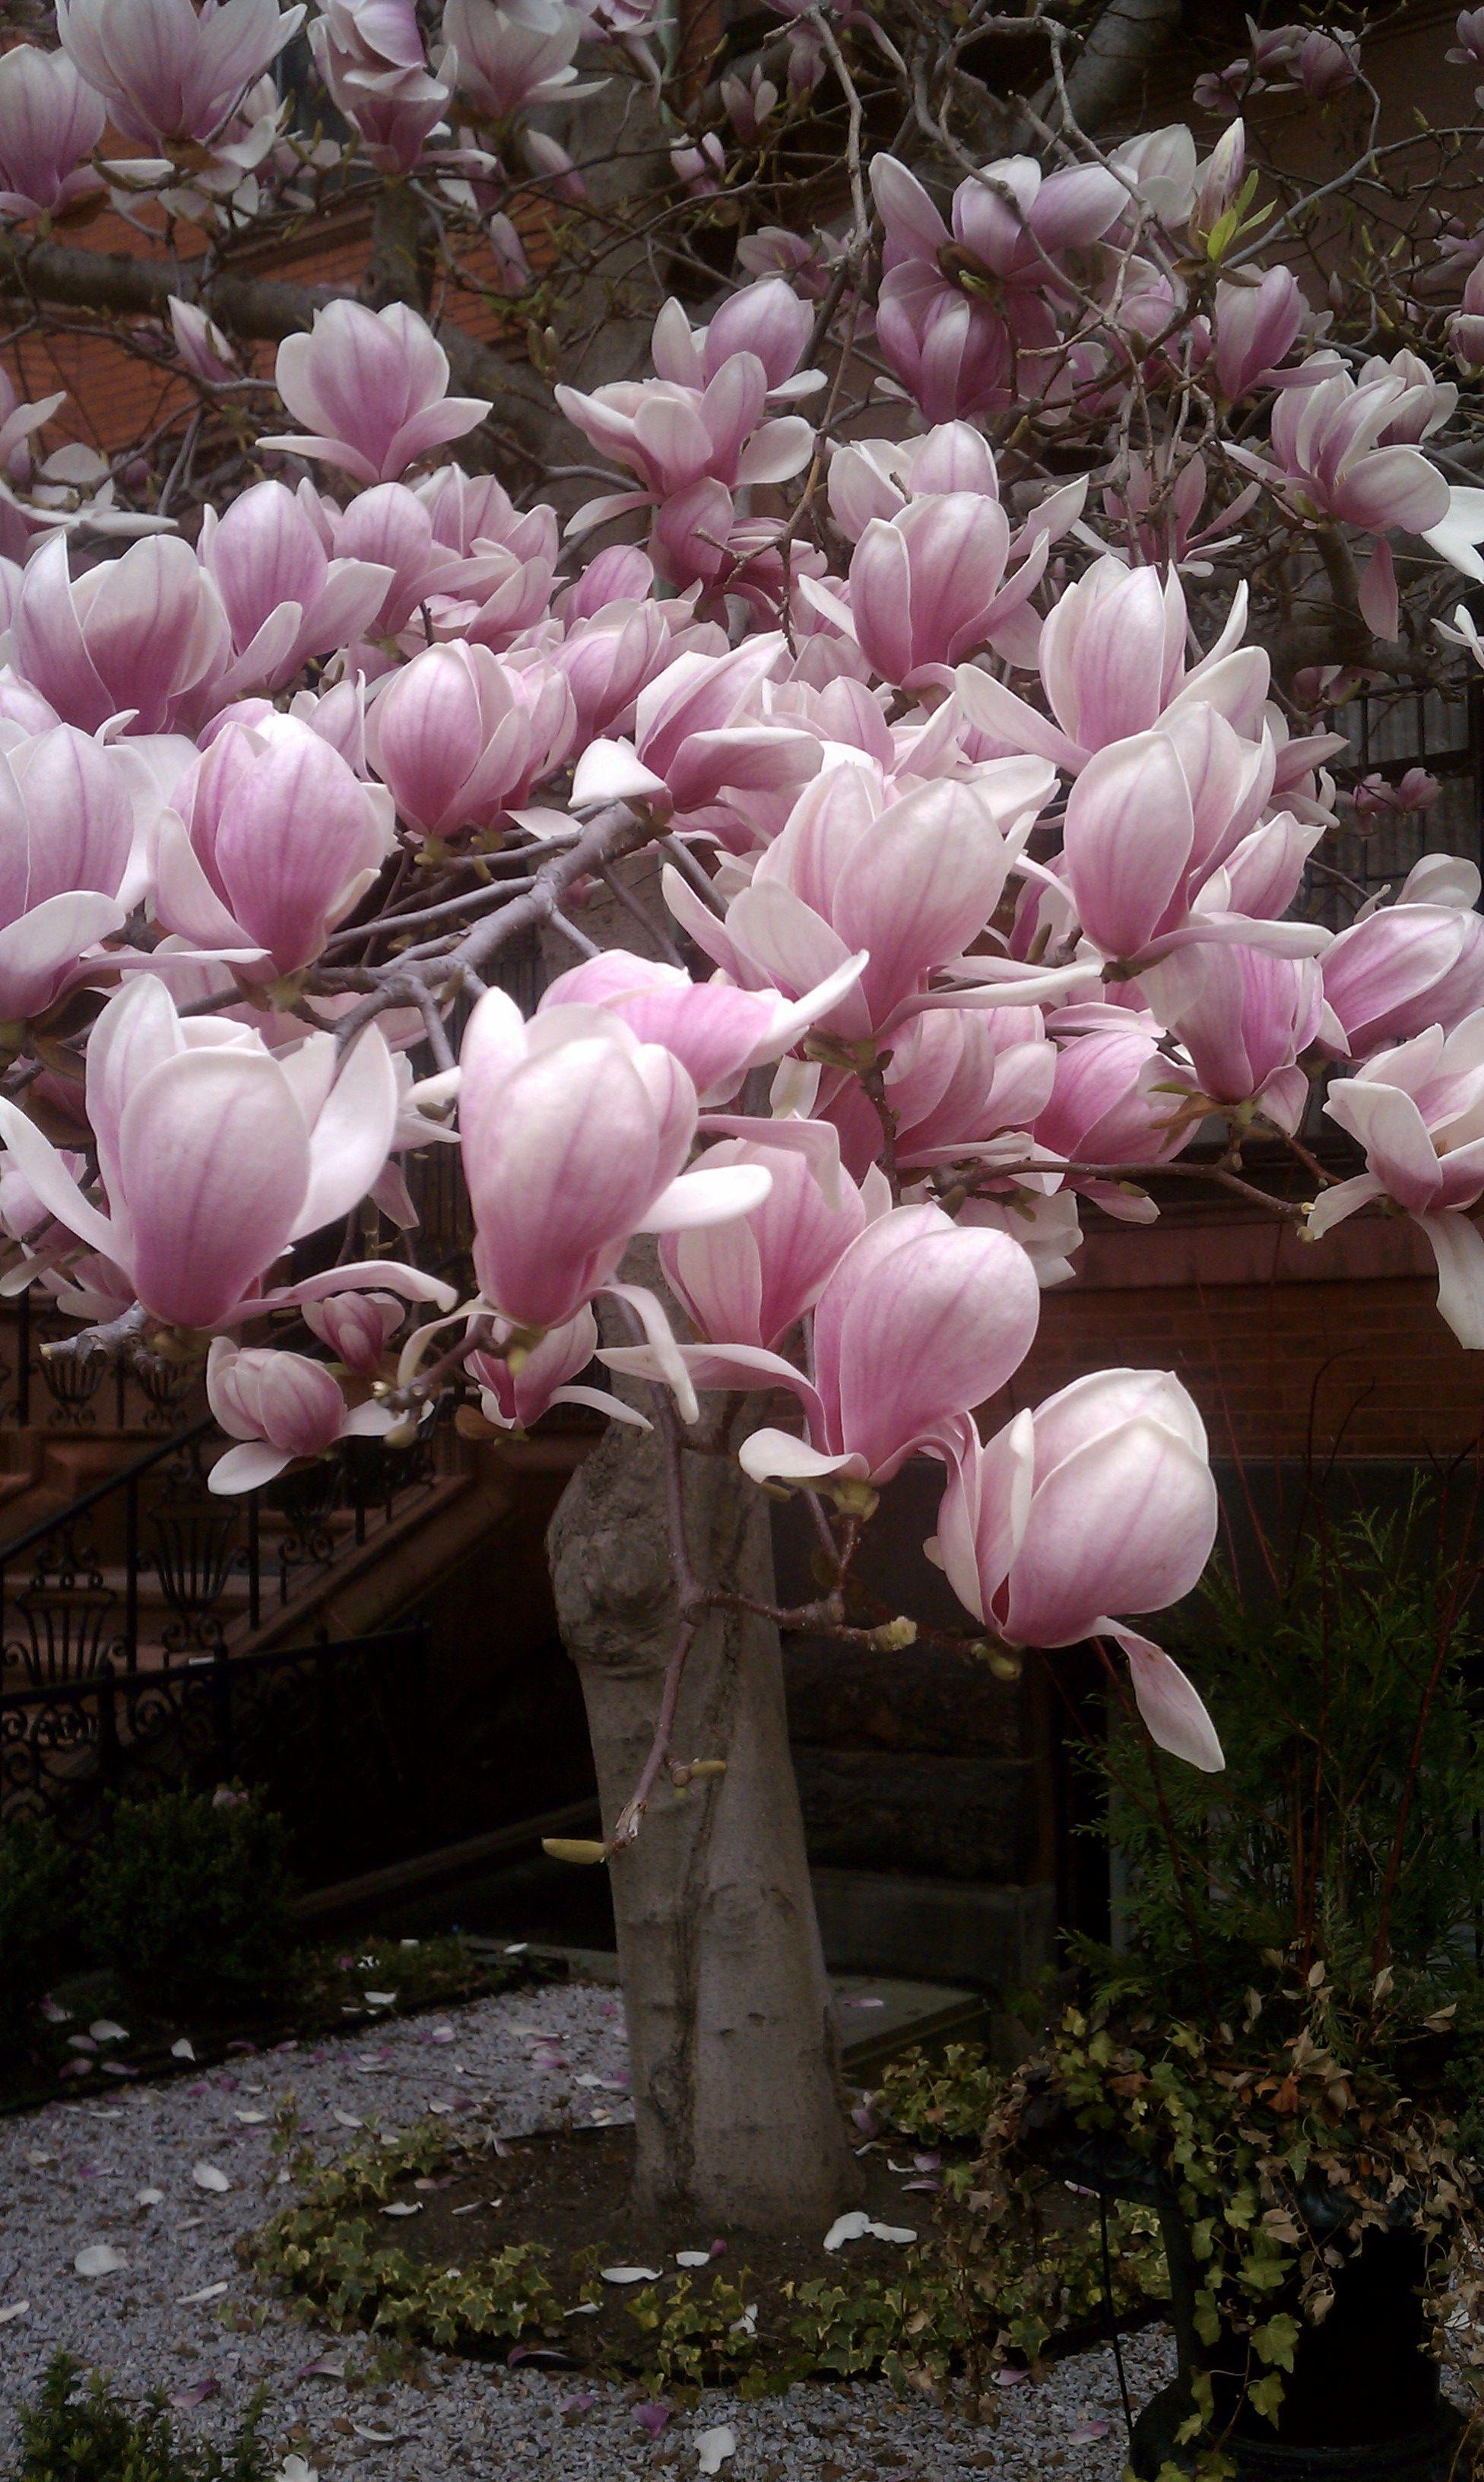 Magnolia Blossoms Up Close White Magnolia Tree Trees To Plant Magnolia Trees